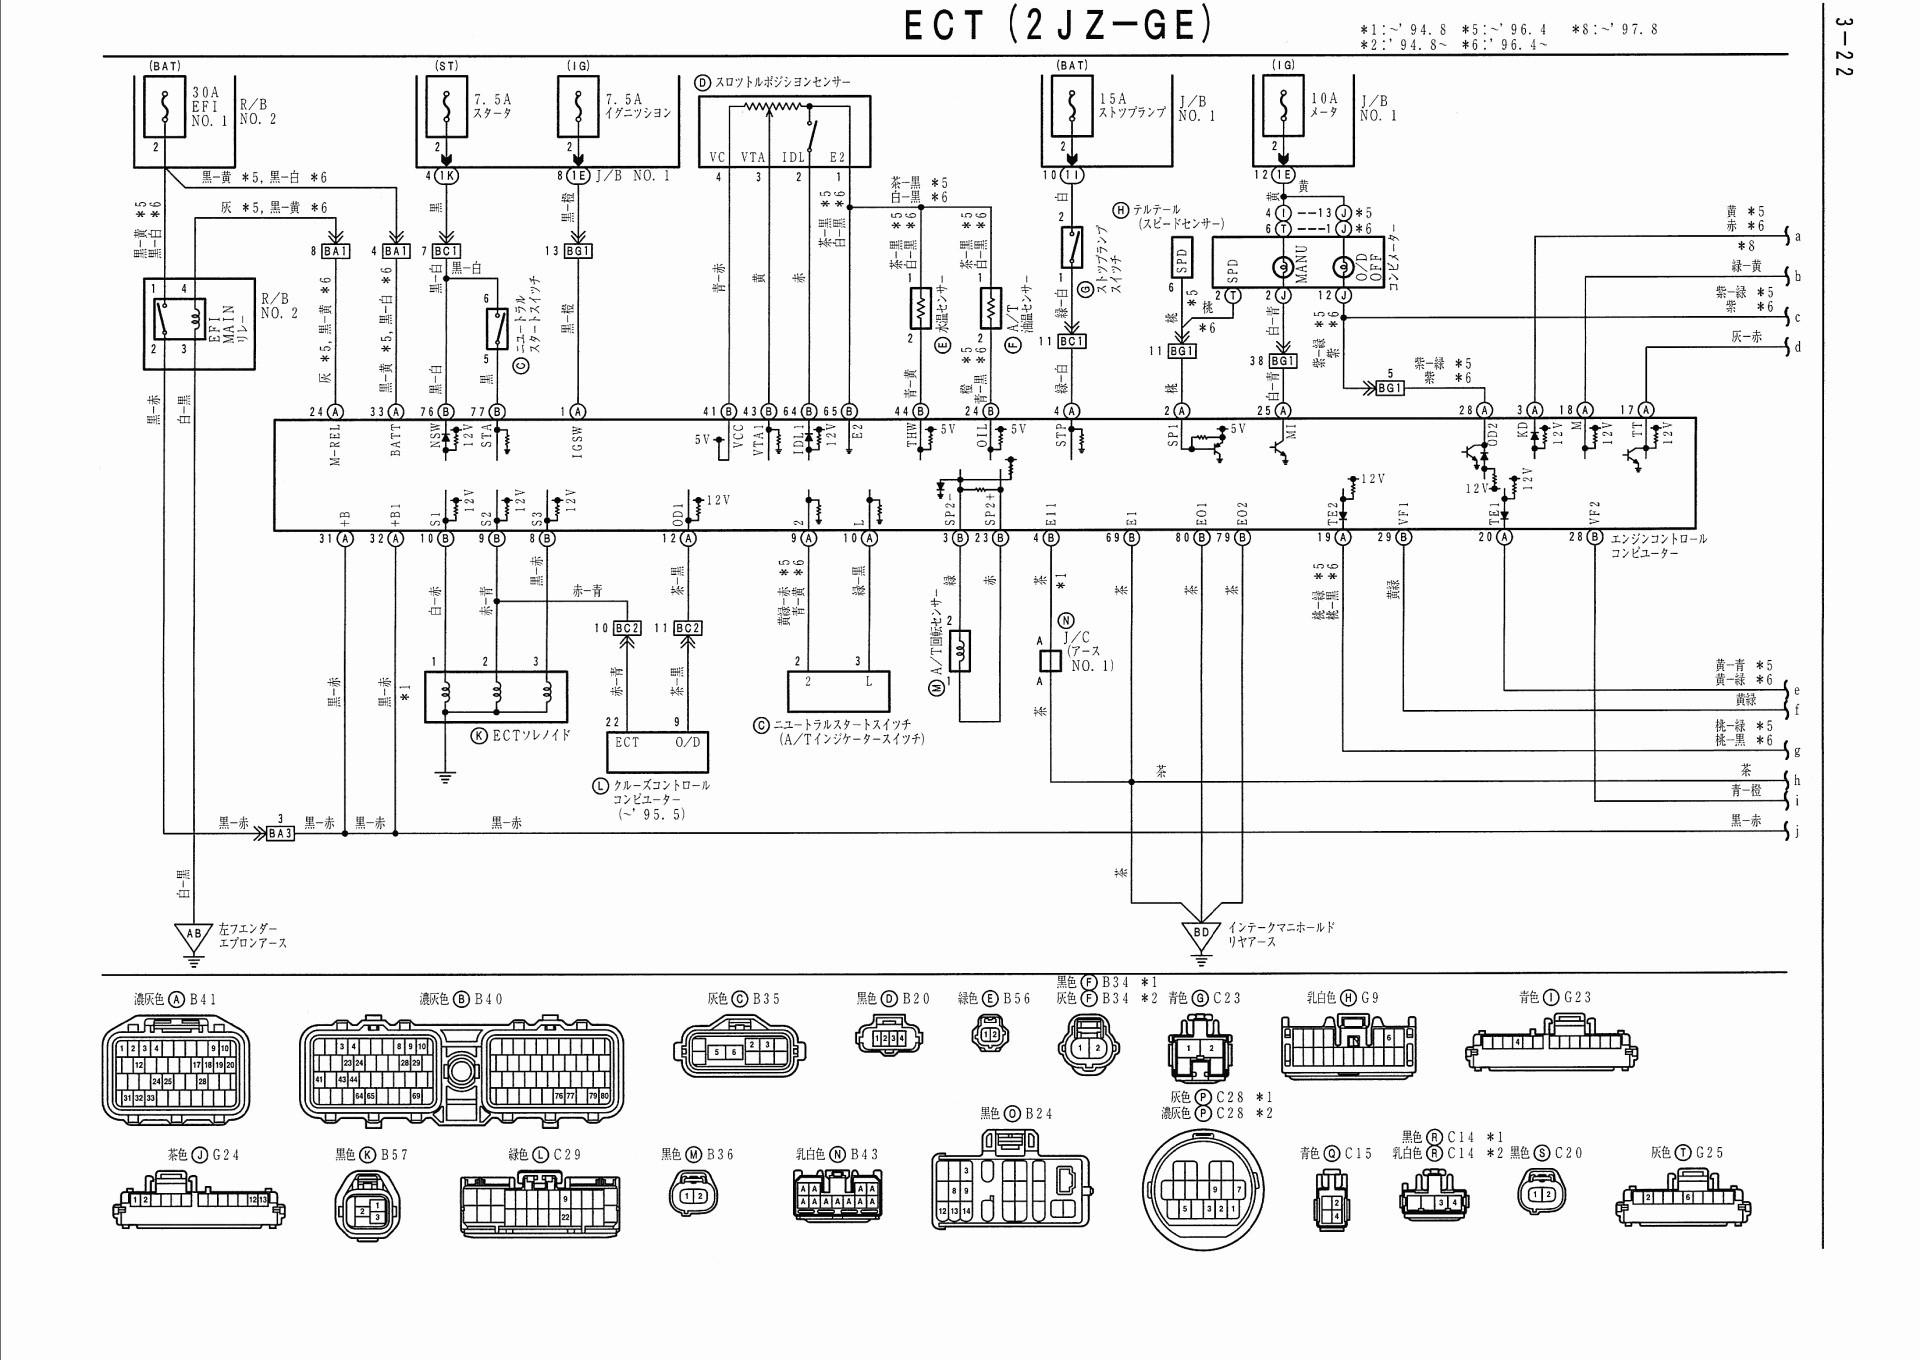 1989 honda prelude si wiring diagram online wiring diagram data